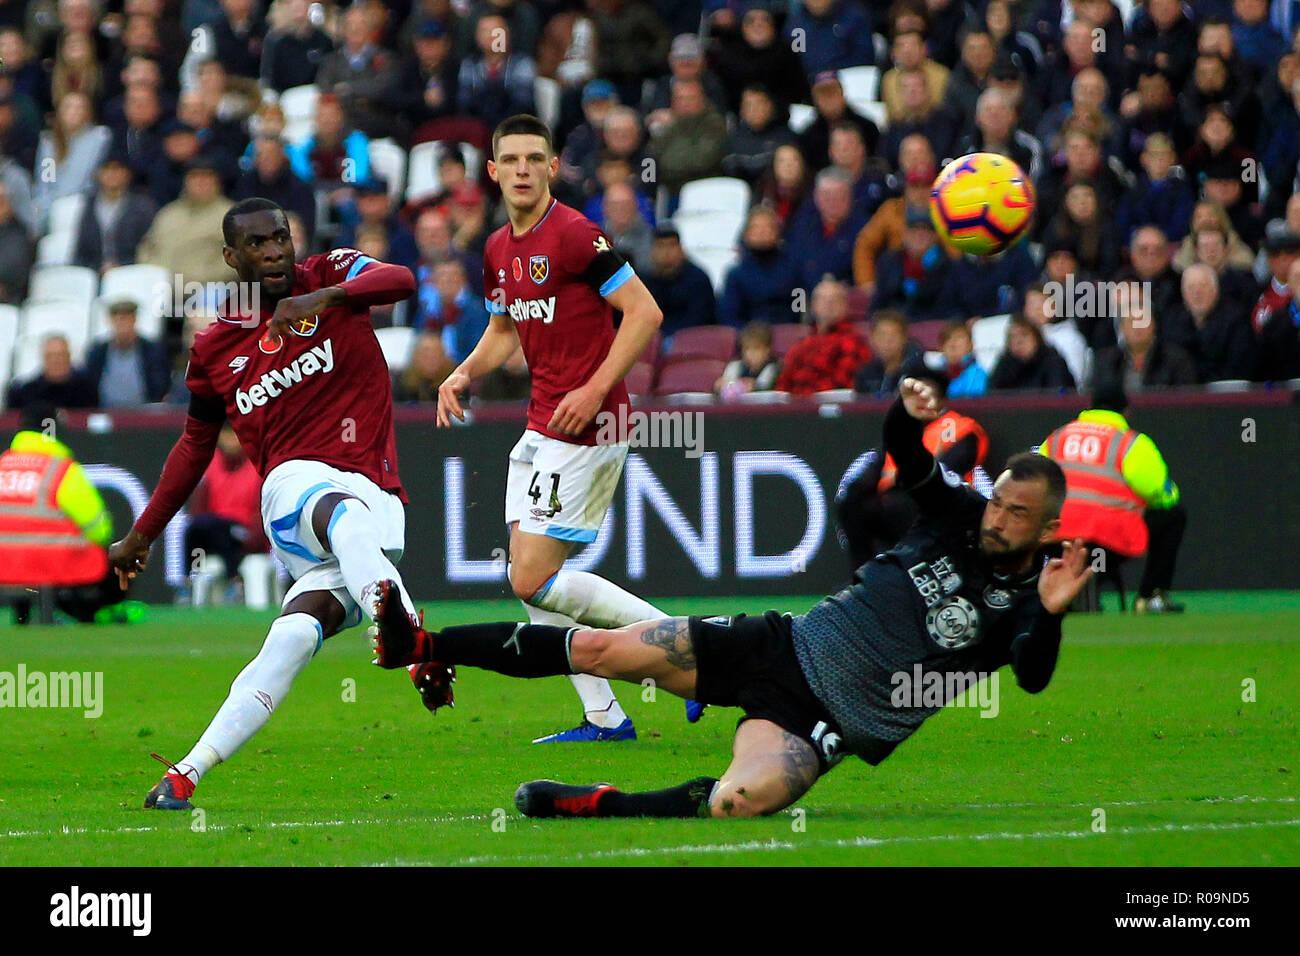 London Uk 03rd Nov 2018 Pedro Obiang Of West Ham United L Takes A Shot At